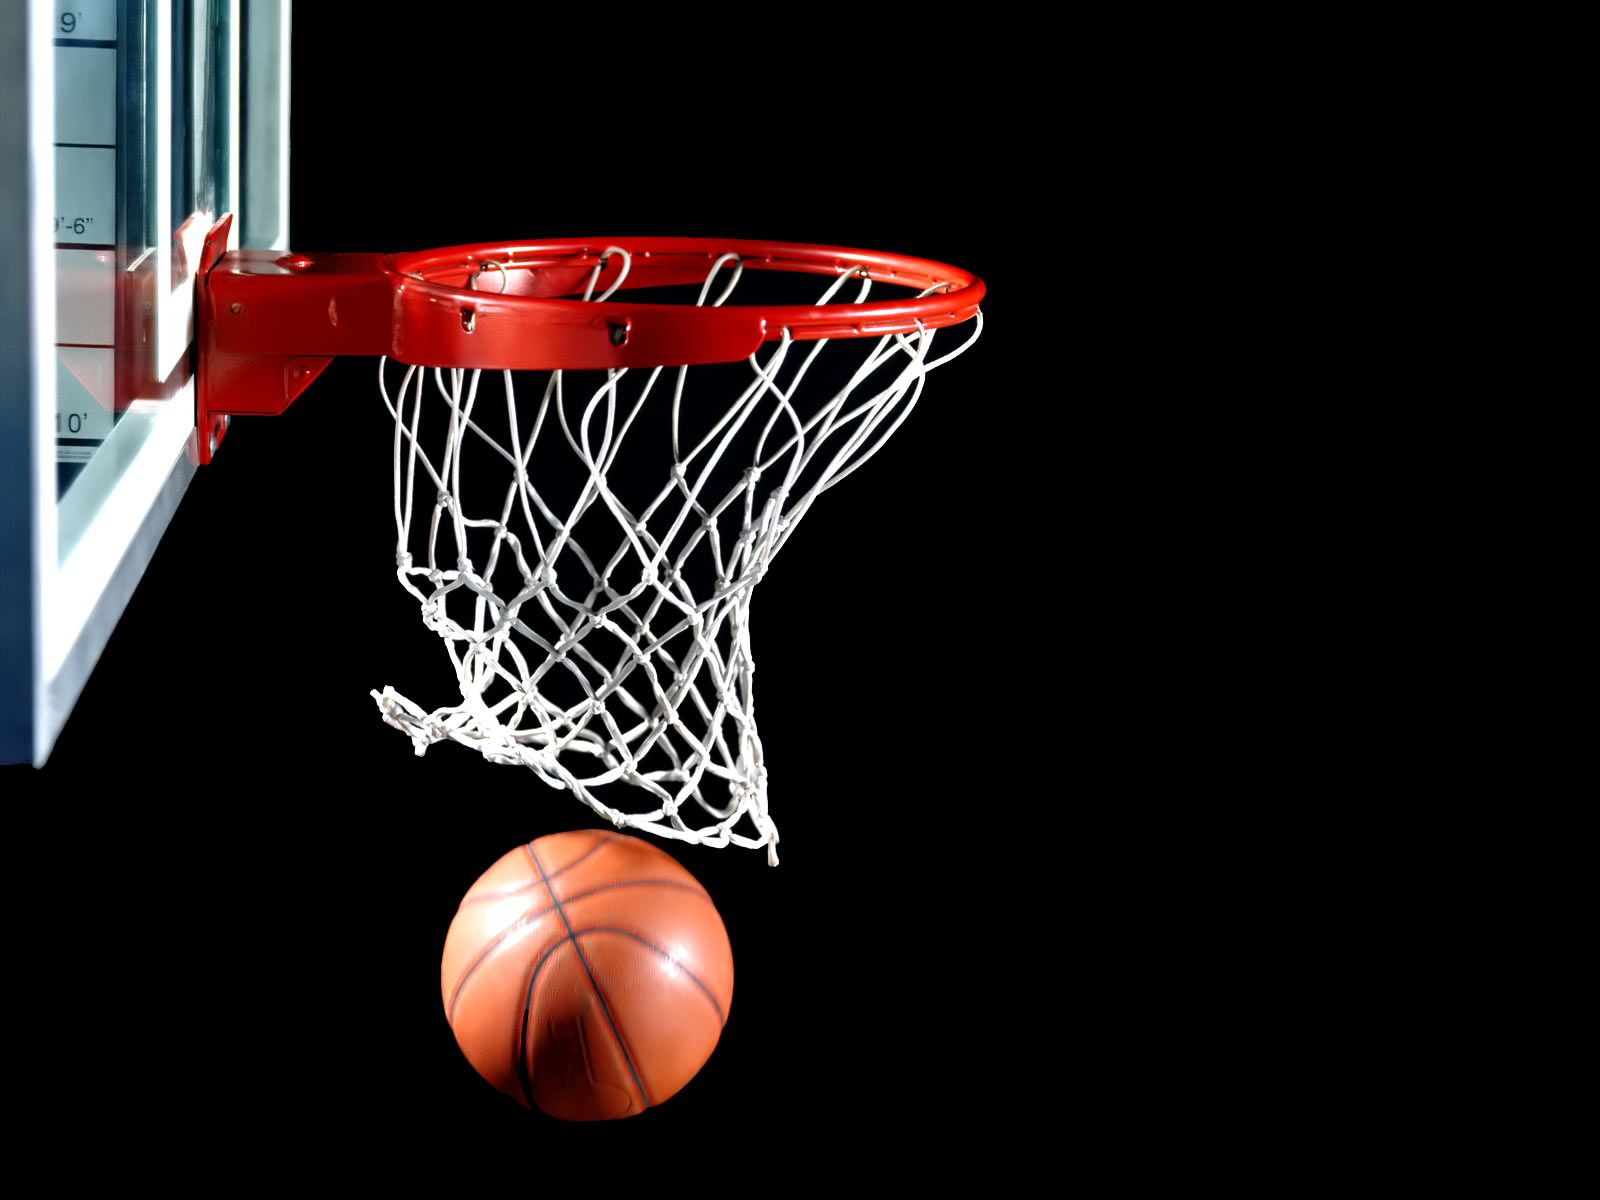 Basketball Hoop Wallpaper Cool Basketball Wallpapers Basketball Hoop Basketball Wallpaper